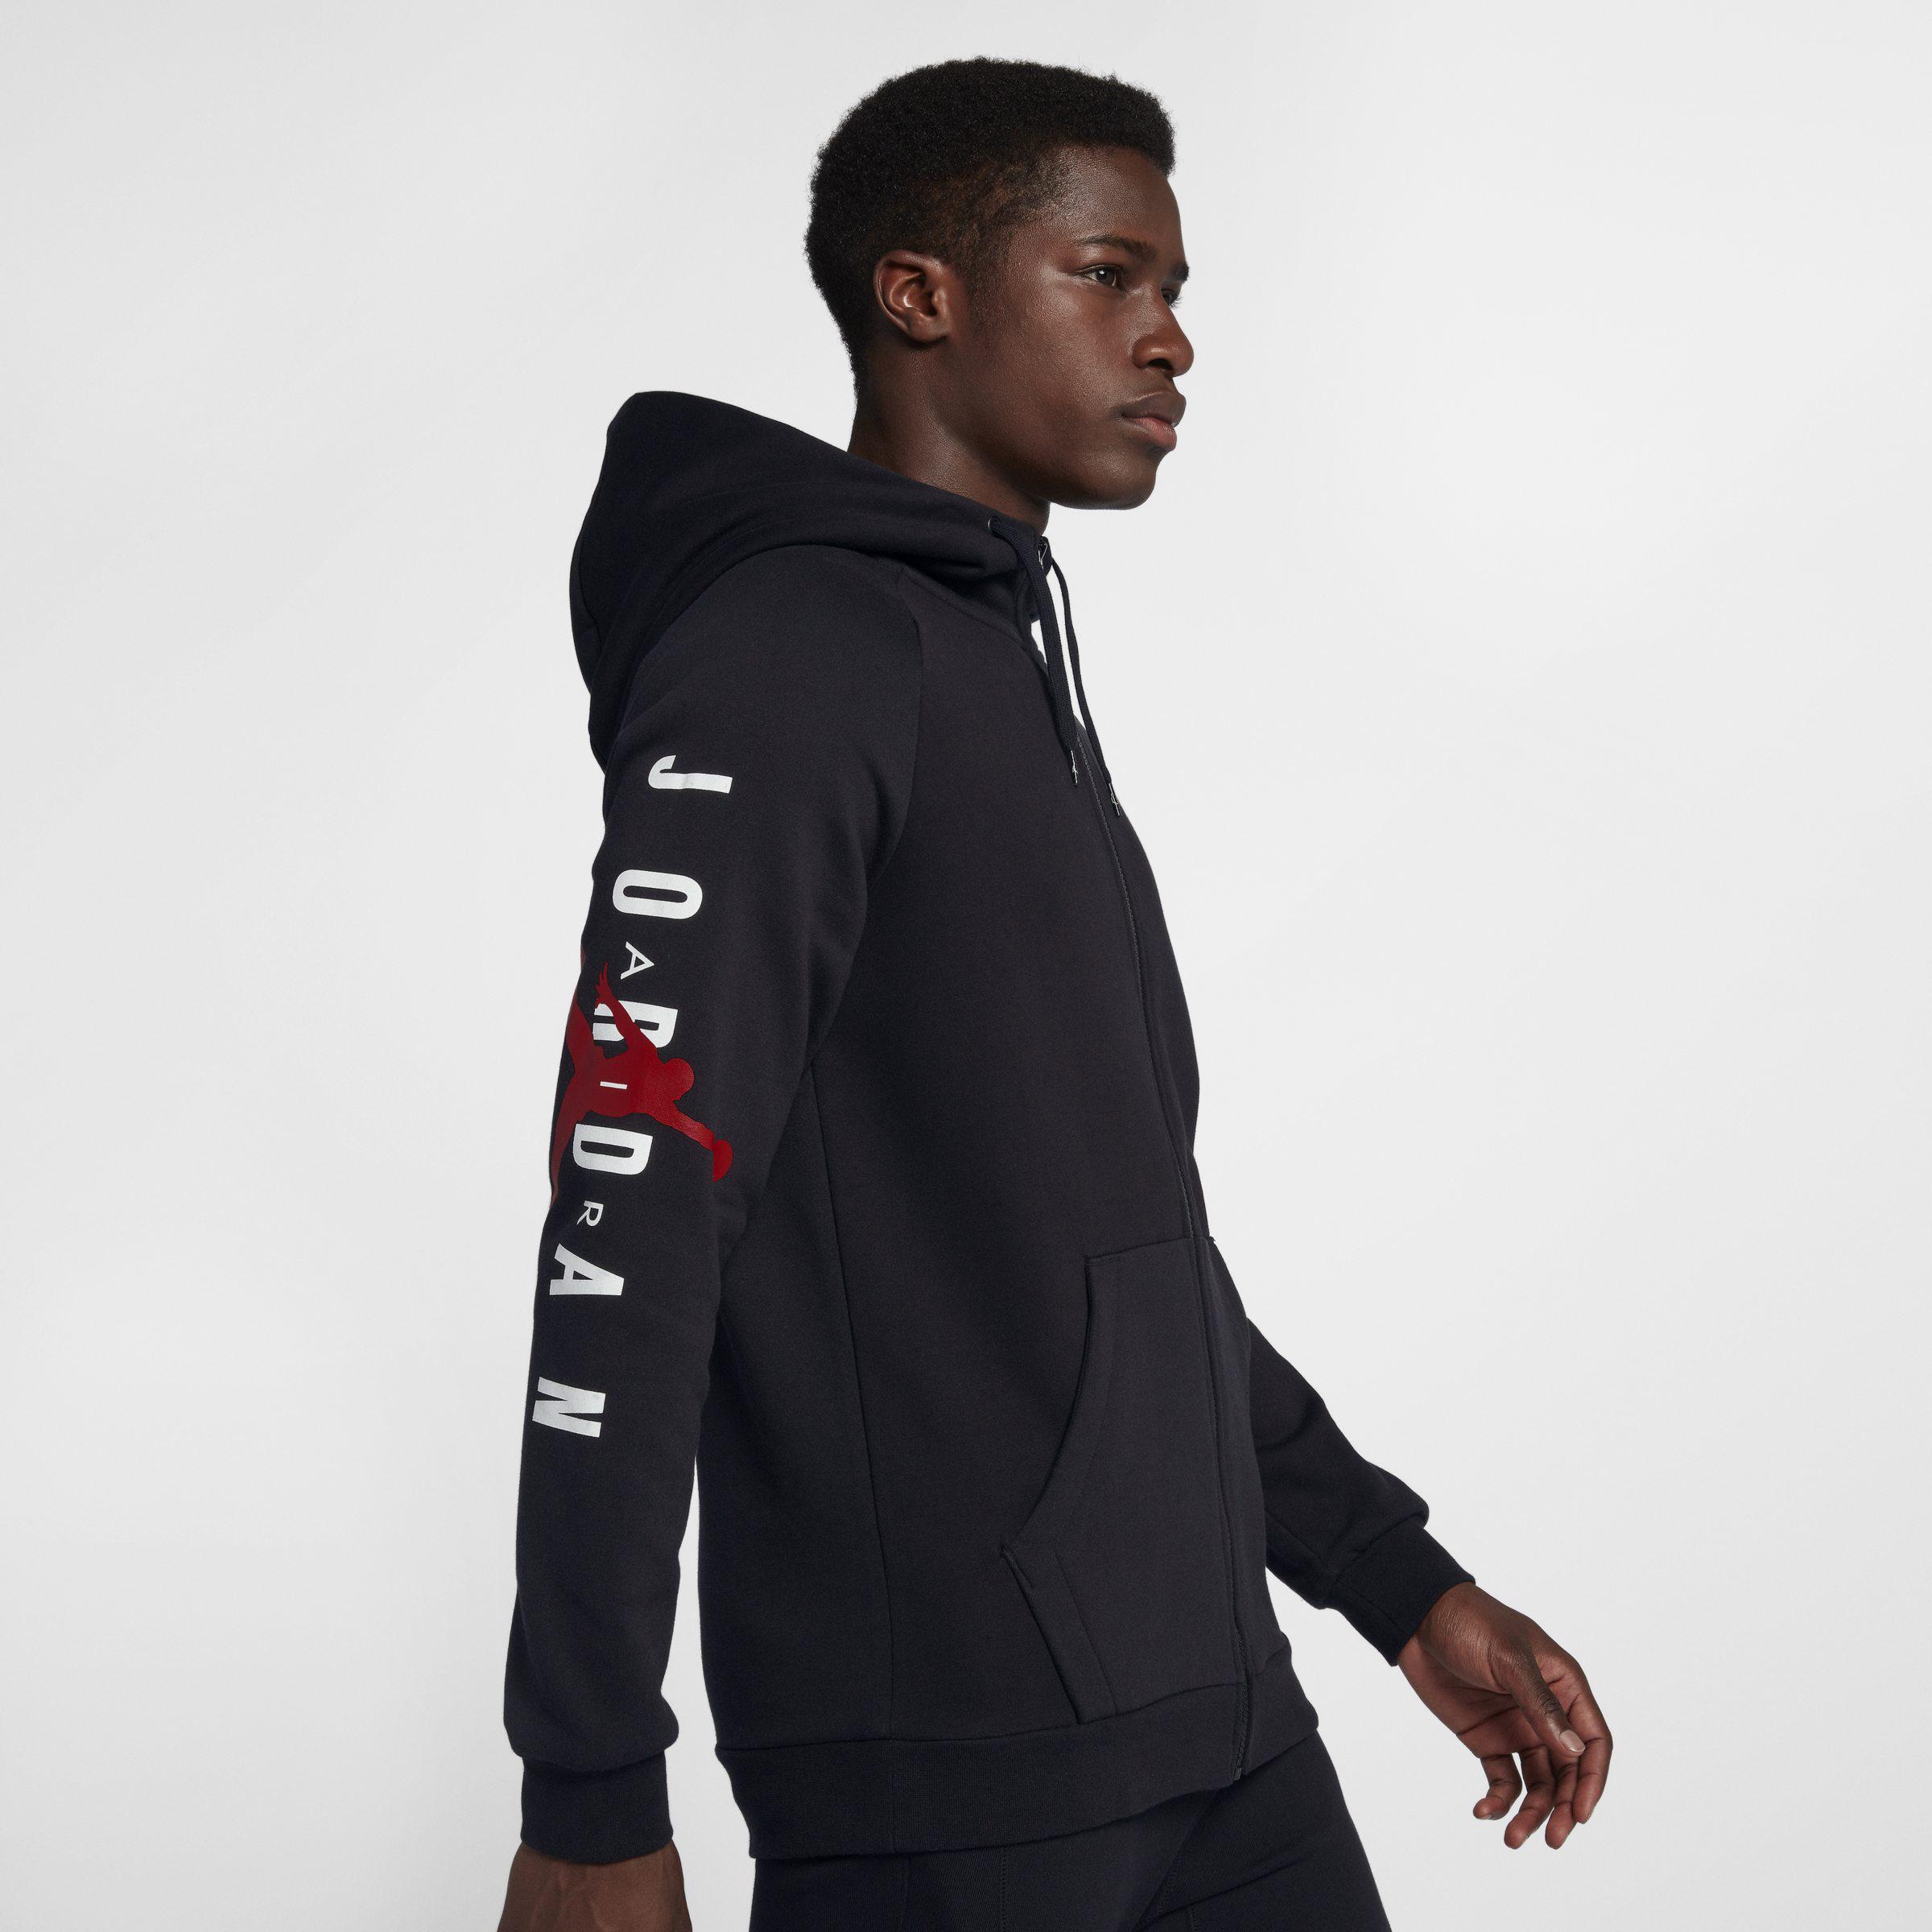 quality design 83ea6 6c1f4 Nike Jordan Jumpman Air Fleece Full-zip Hoodie in Black for Men - Lyst